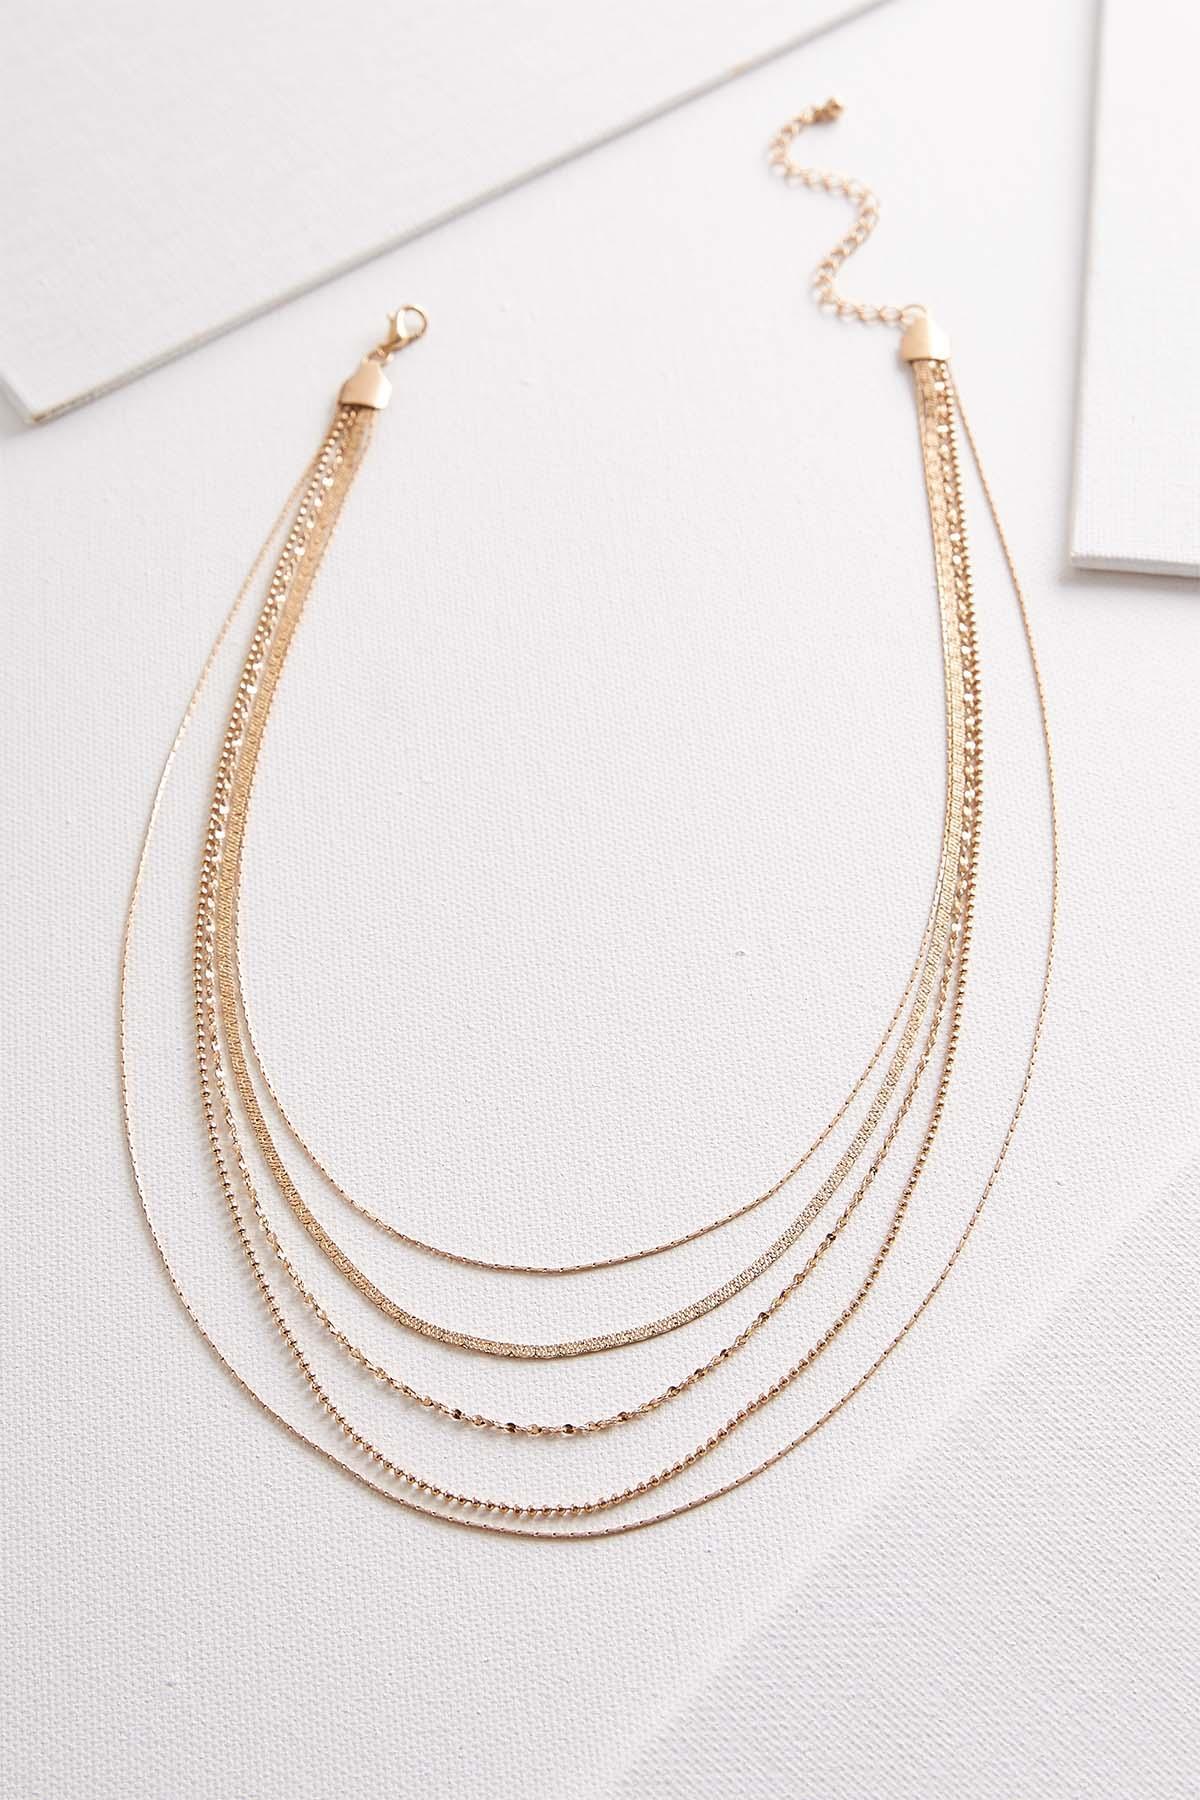 Dainty Layered Chains